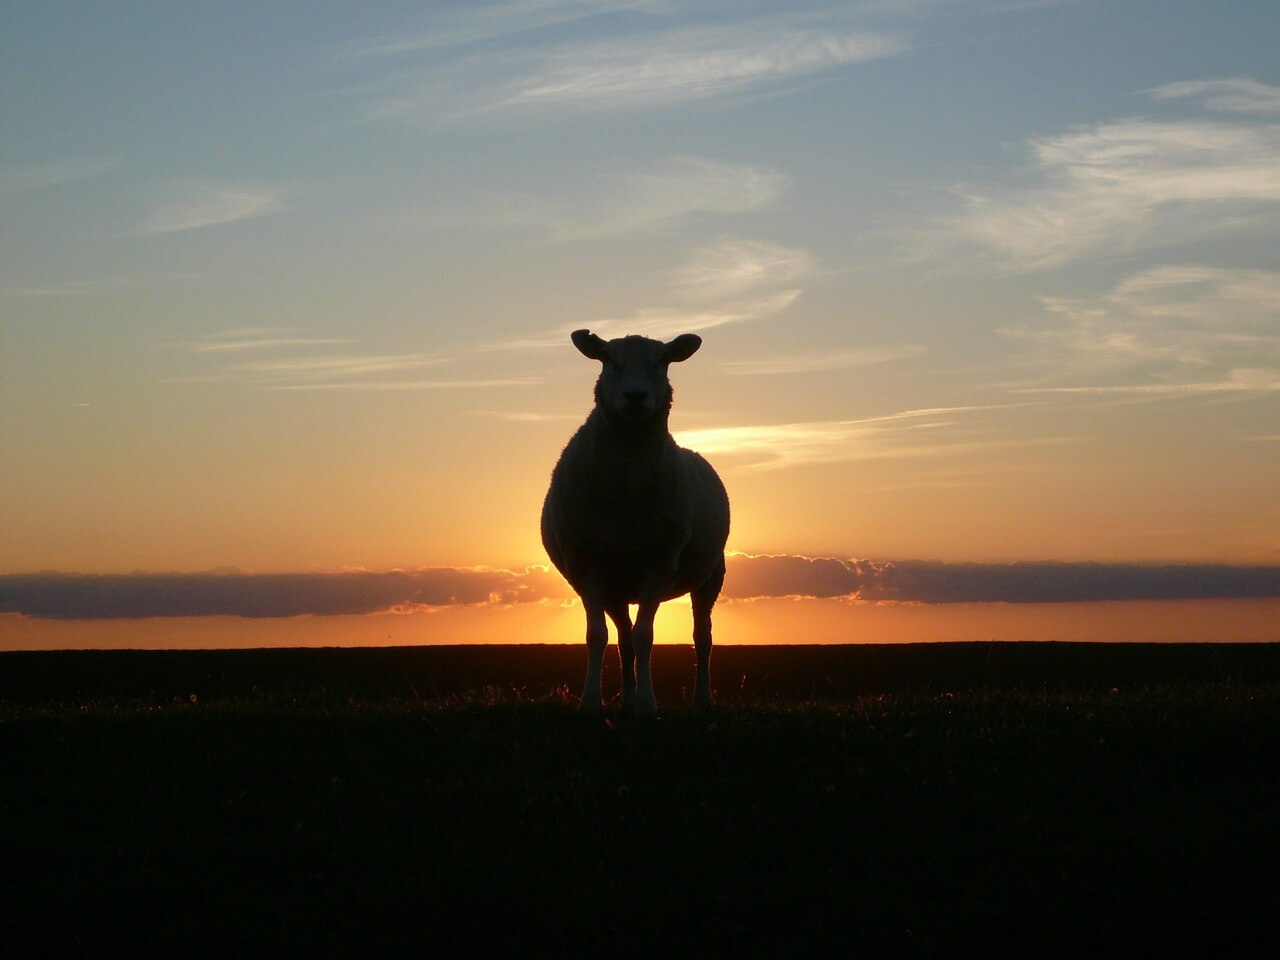 sunset-50494_1280-2-1.jpg